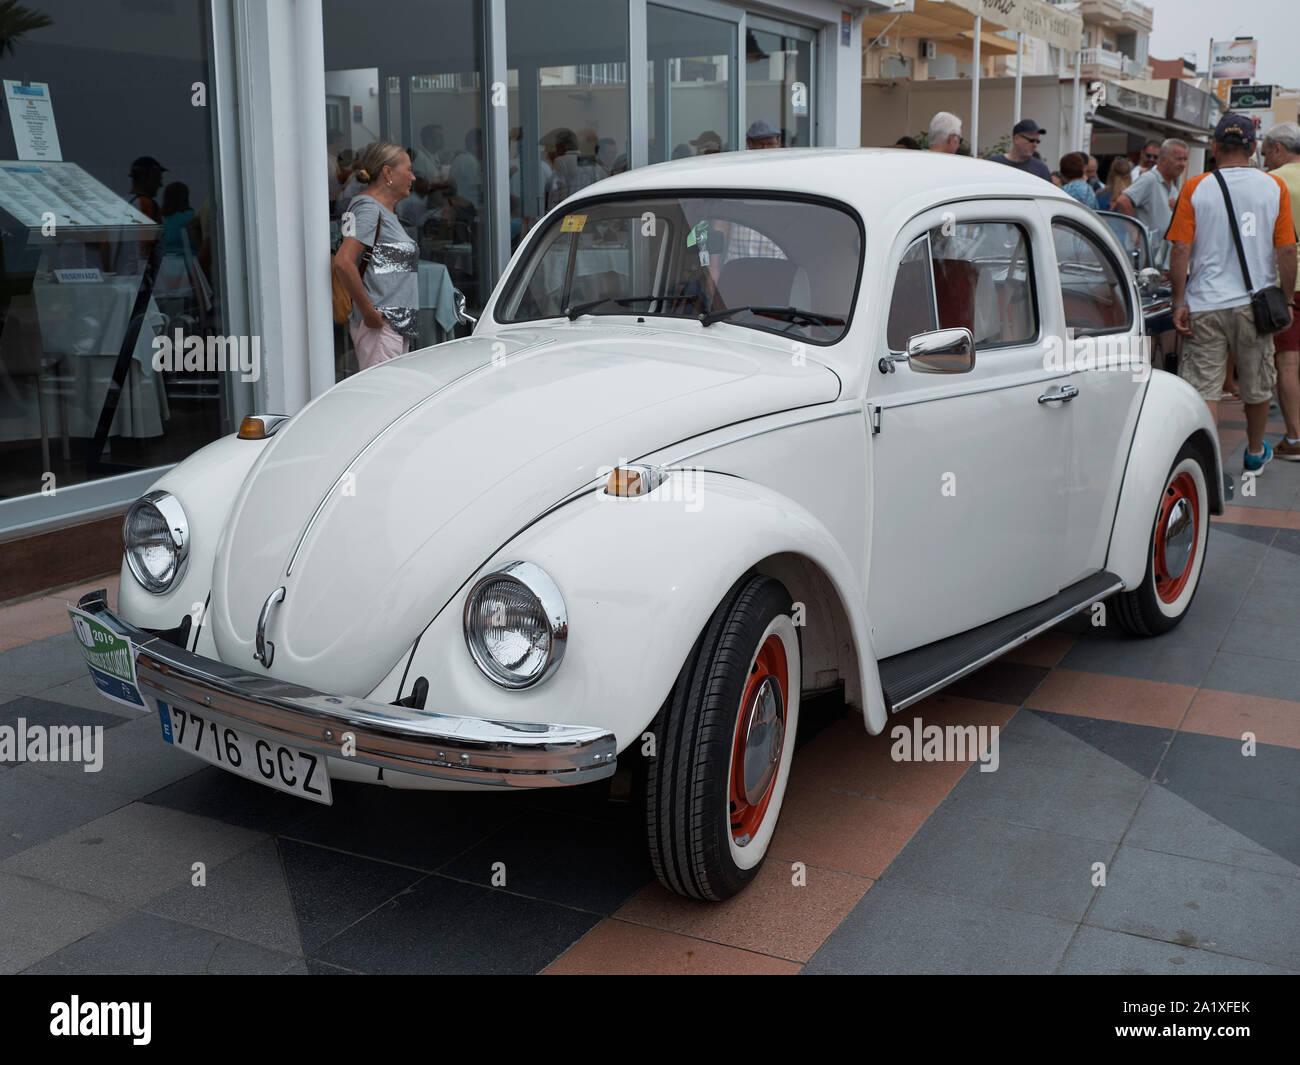 Volkswagen Beetle. Classic car réunion à Torremolinos, Malaga, Espagne. Banque D'Images